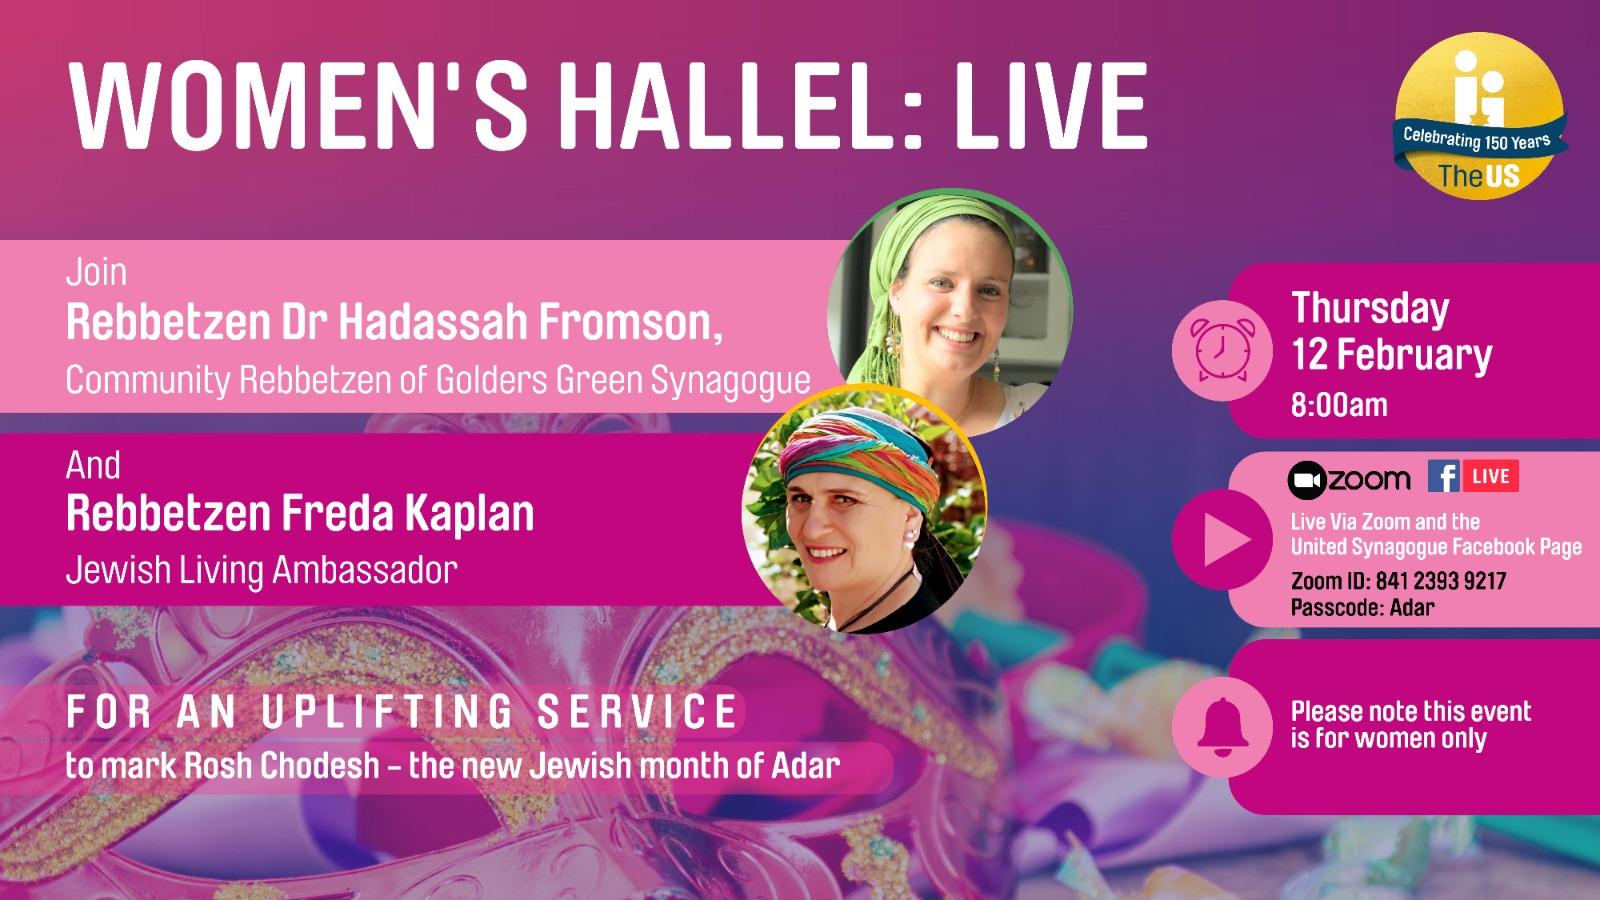 Women's Hallel: Live